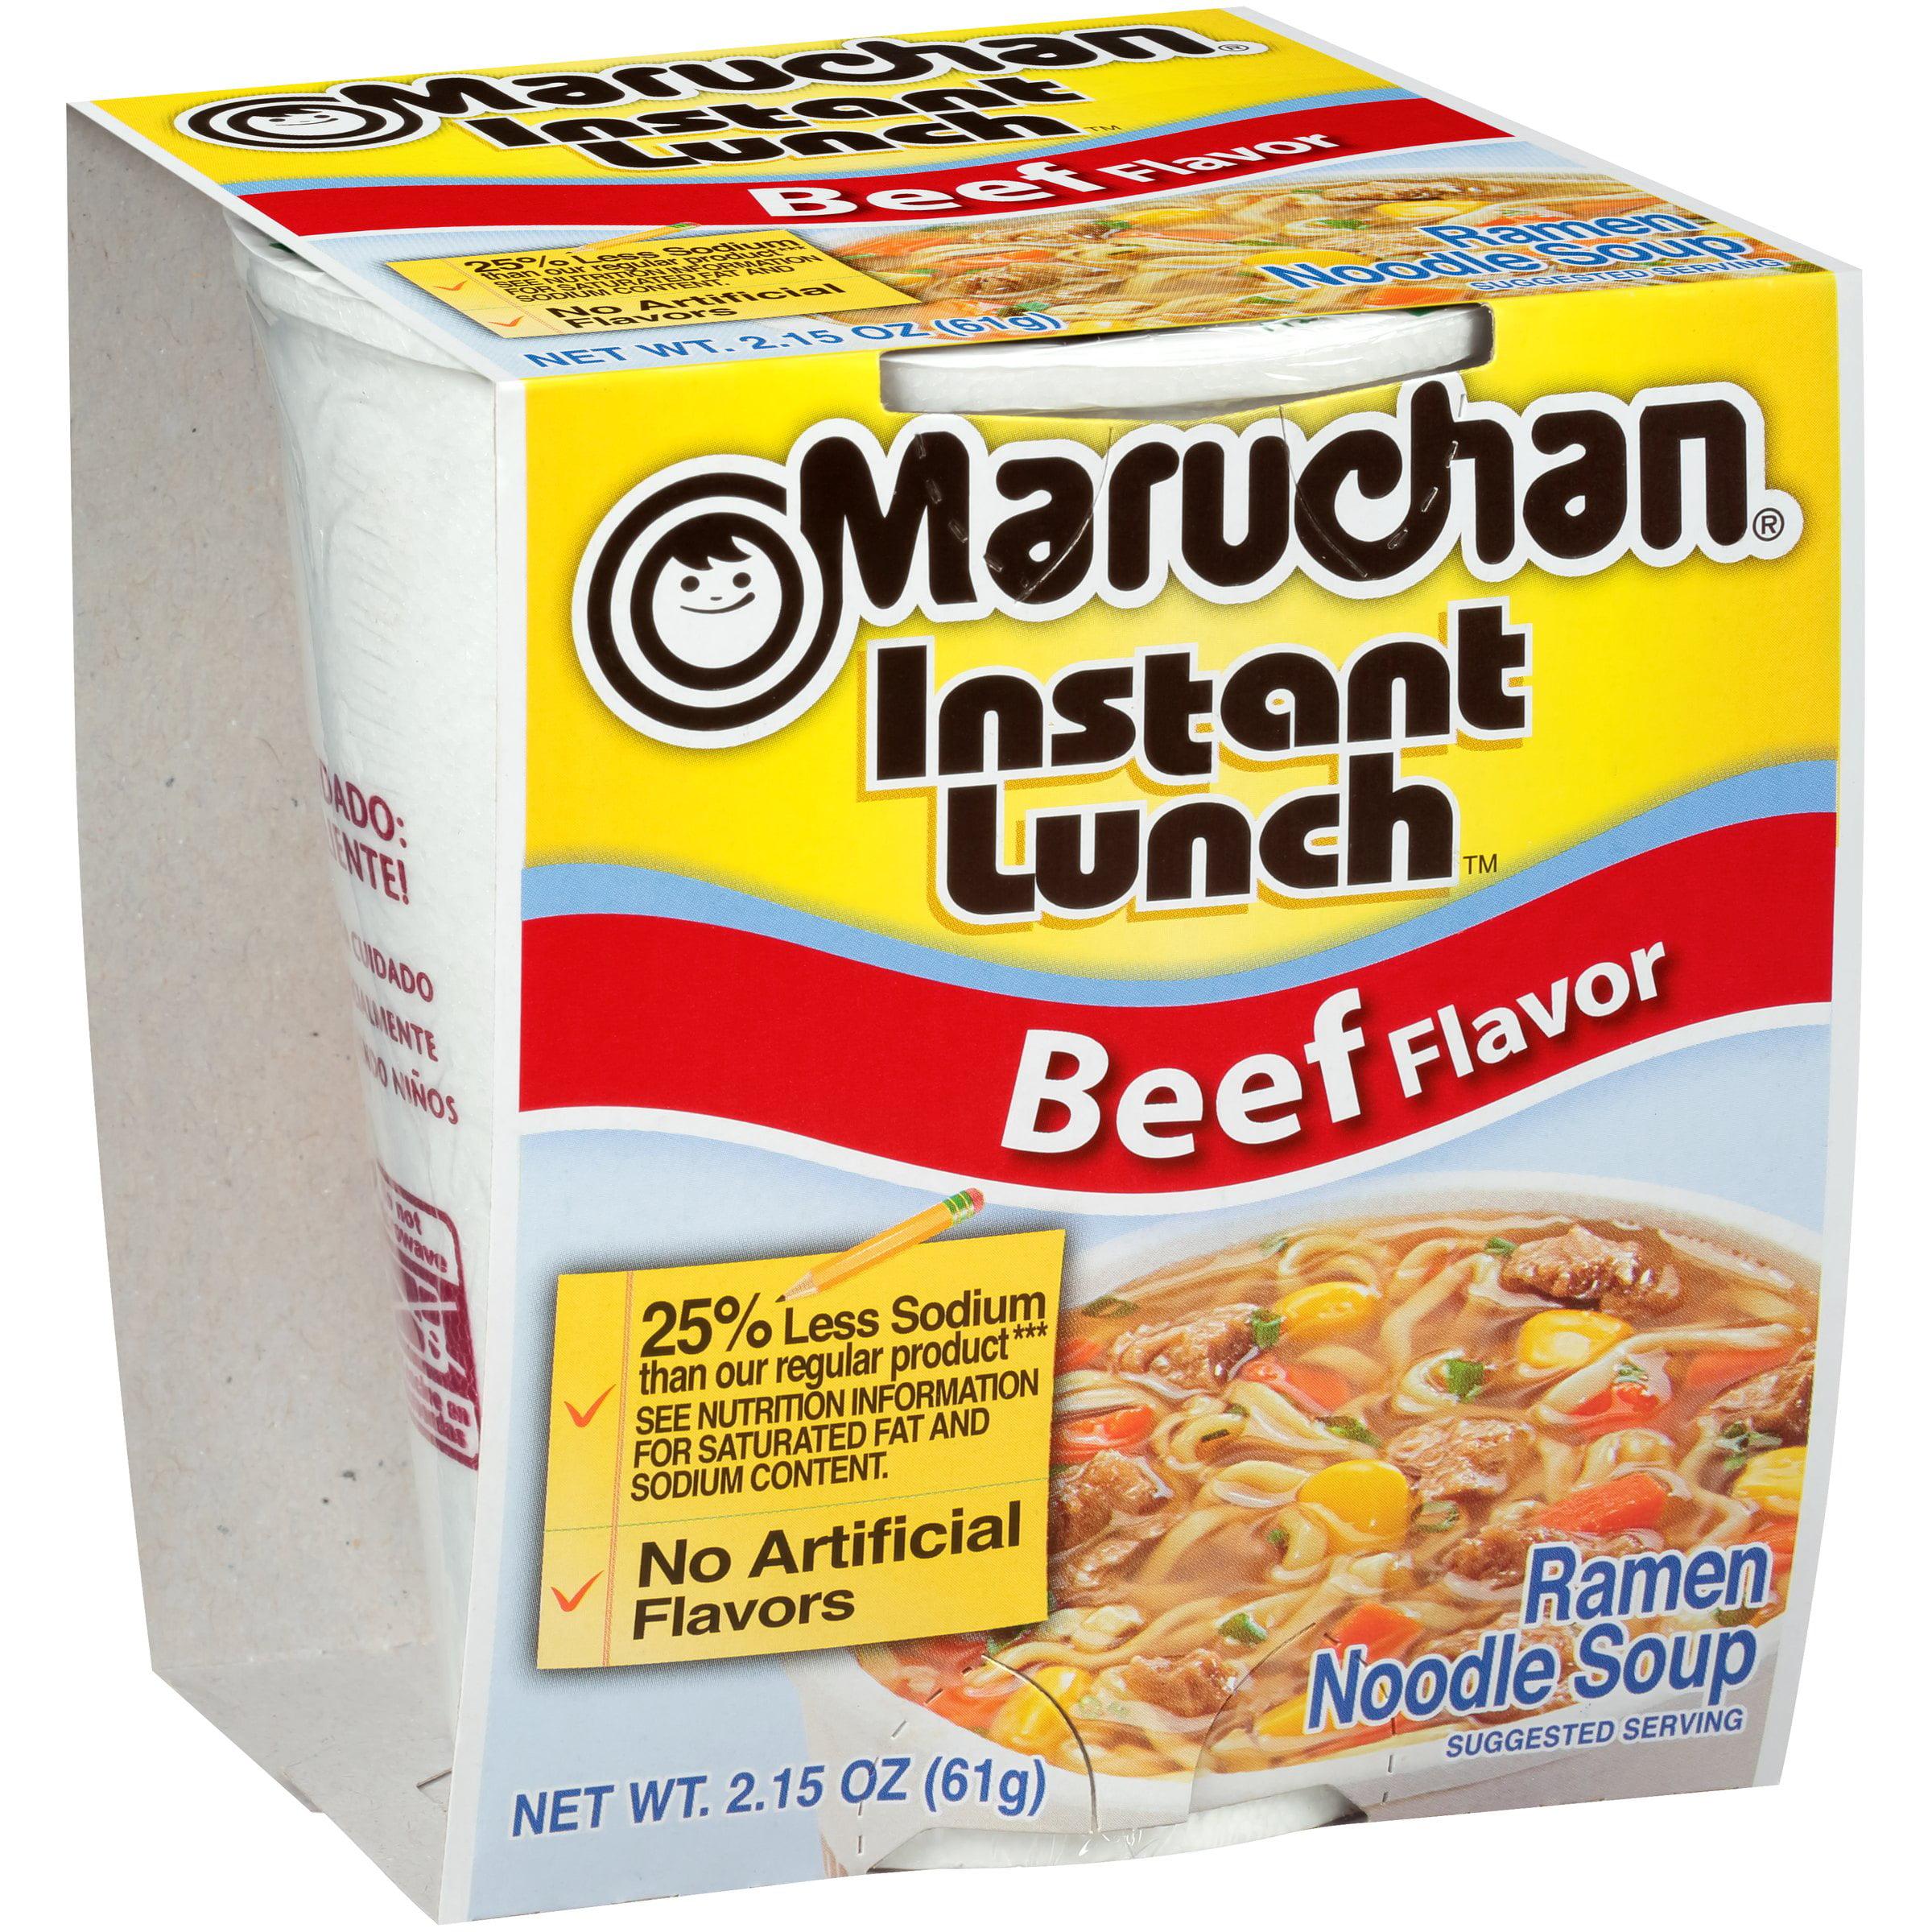 Maruchan® Instant Lunch™ Beef Flavor